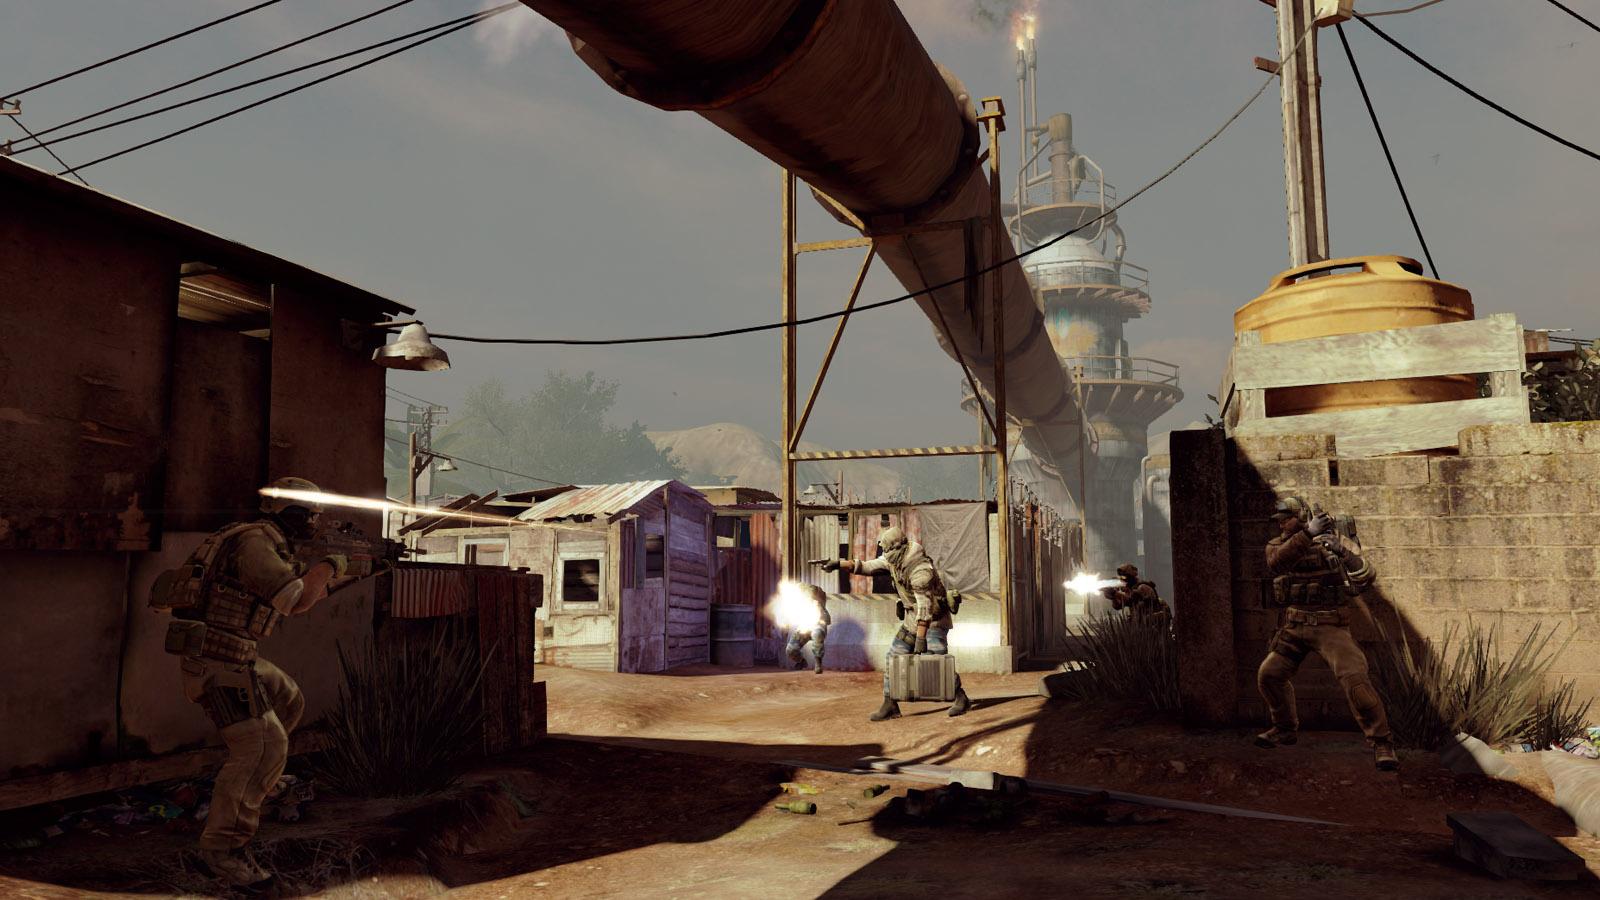 Room Cover Ghost Recon Ghost Recon Future Soldier Wii: Tom Clancy's Ghost Recon: Future Soldier Review (PS3